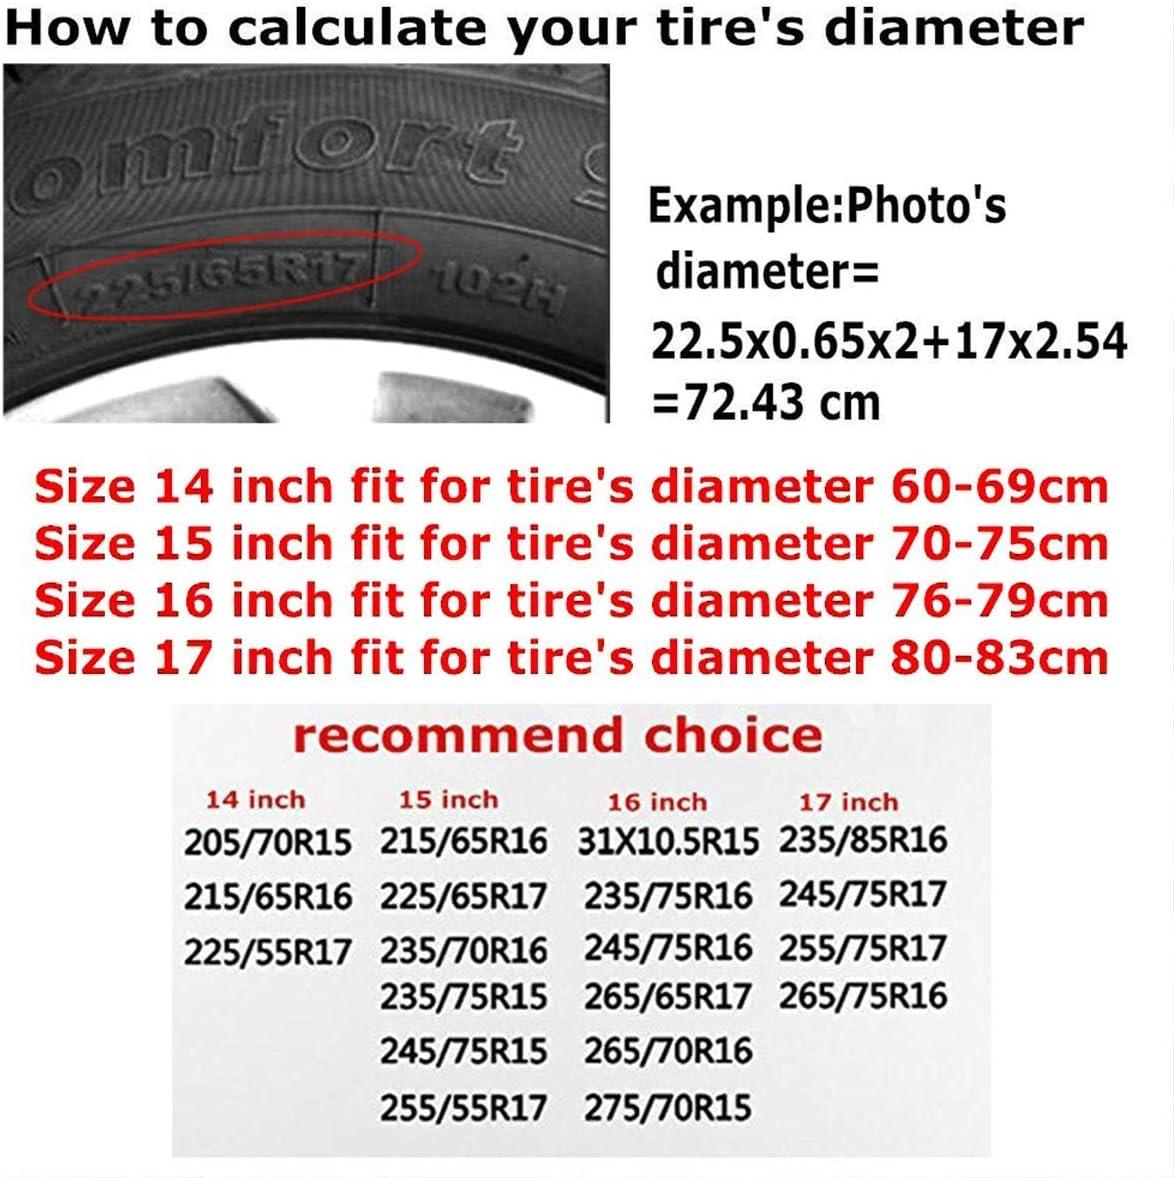 SUV Truck Wheel,Camper Travel Trailer Accessories SHOE GONE Car Tire Cover American Flag Spare Wheel Tire Cover for Trailer RV 14,15,16,17 Inch